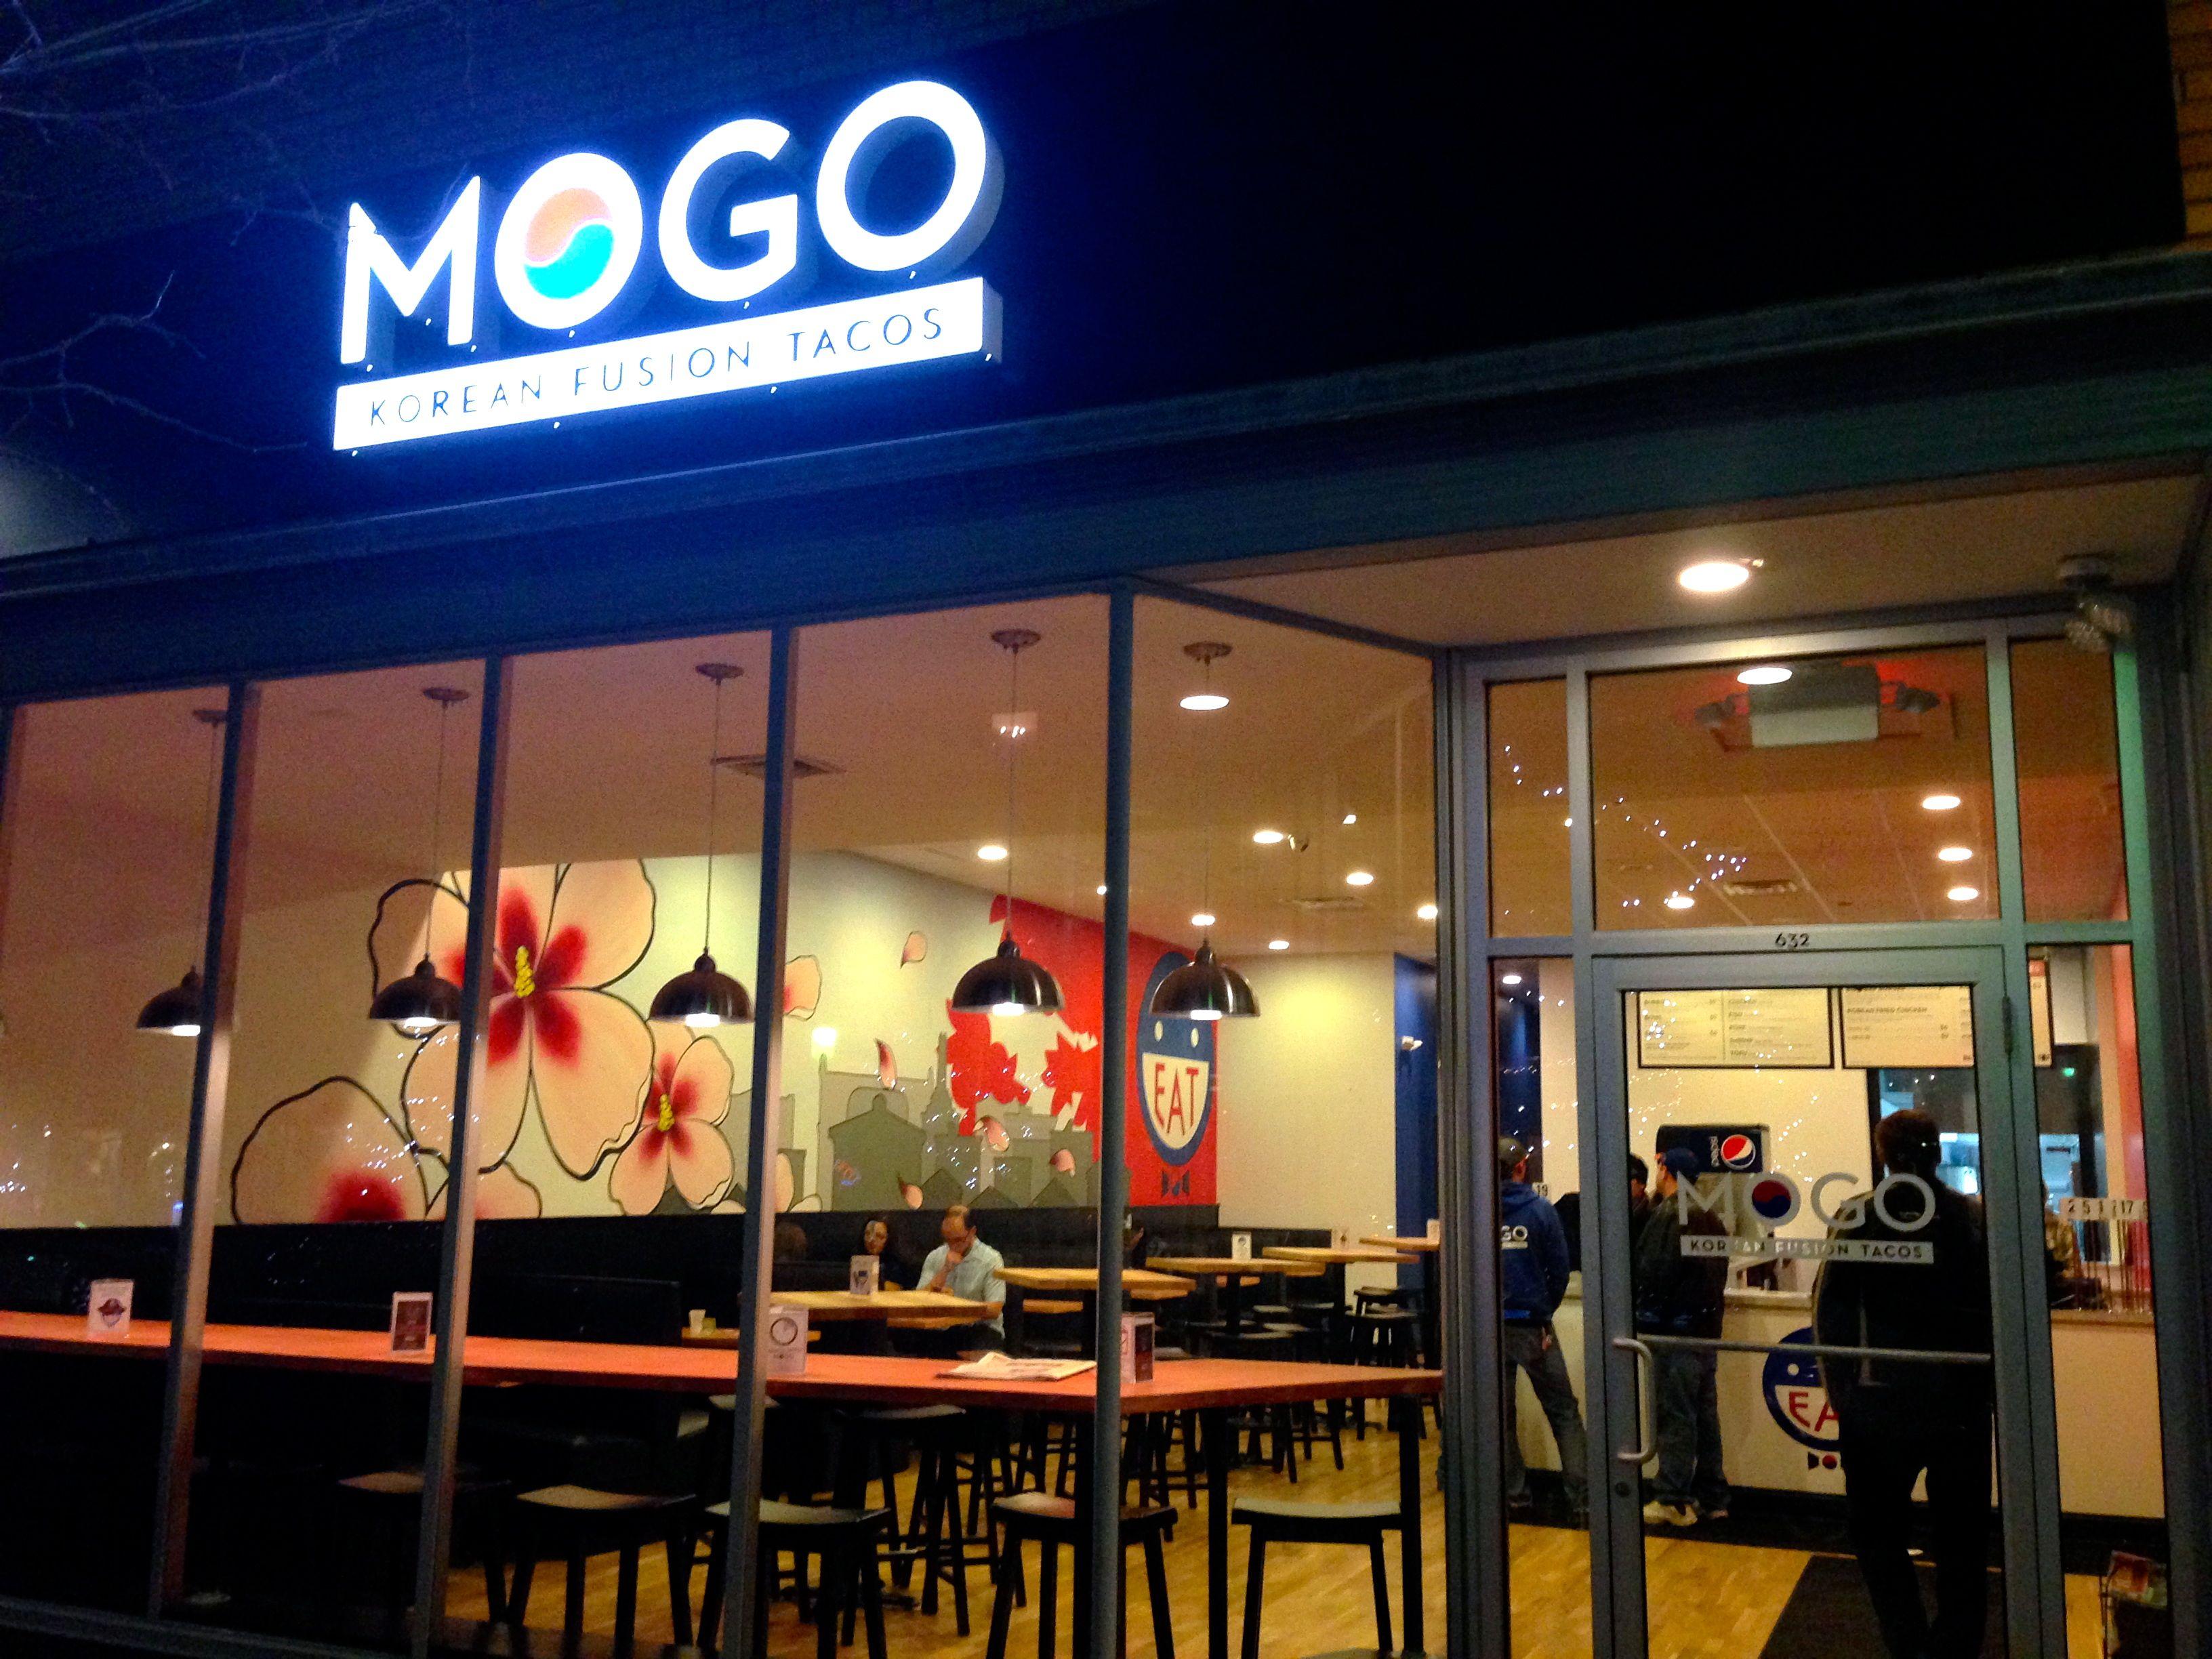 Dinner For 21900 At Mogo A Korean Fusion Fast Food Restaurant In